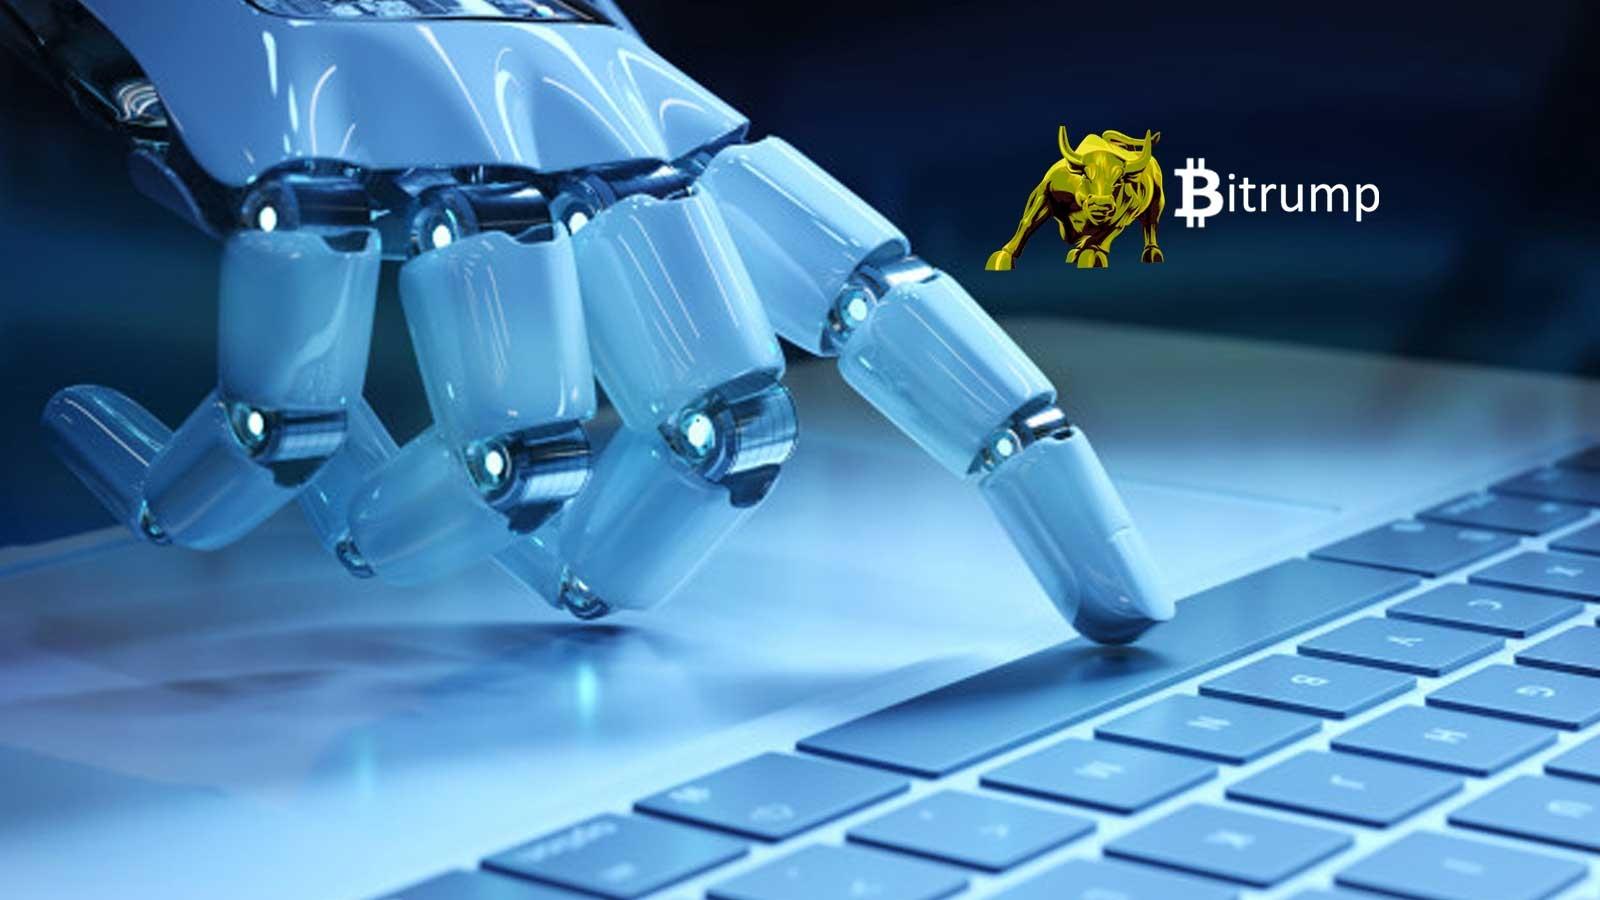 Bitrump crypto exchange in UAE adds new altcoins to portfolio